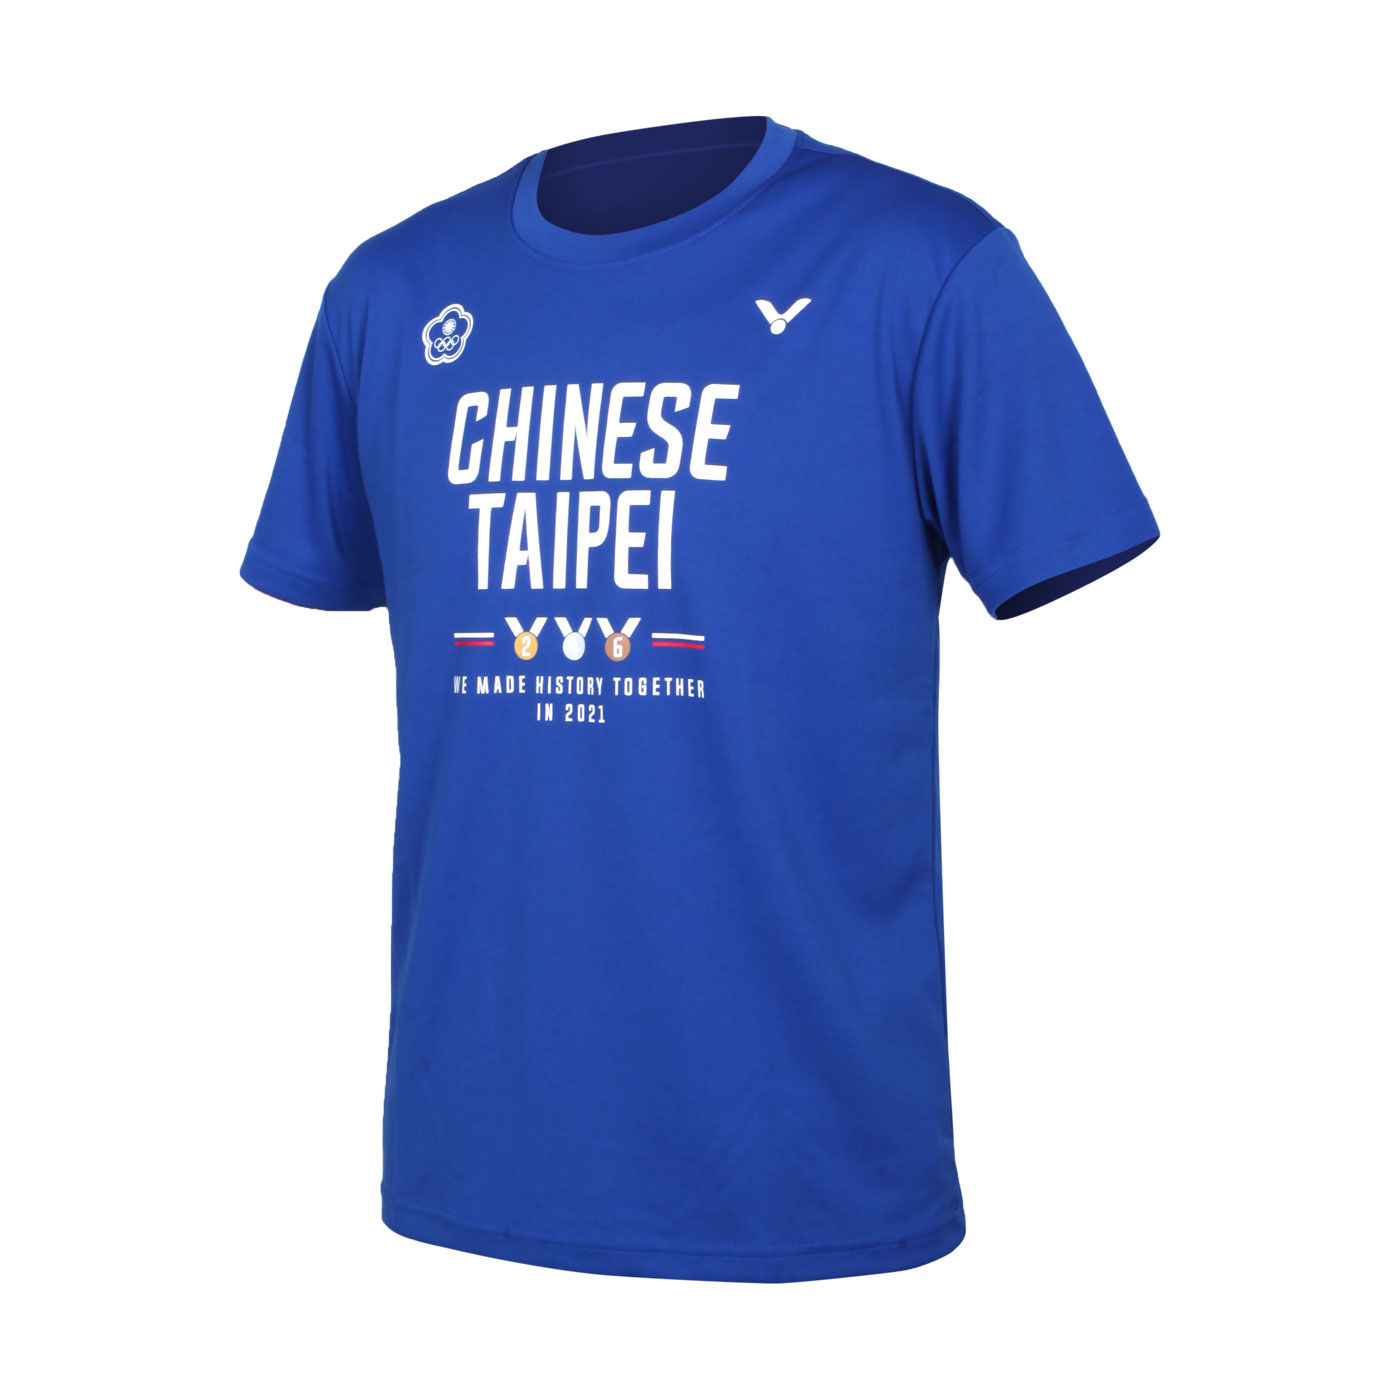 VICTOR 東京奧運中華隊官方紀念短袖T恤 T-2171B